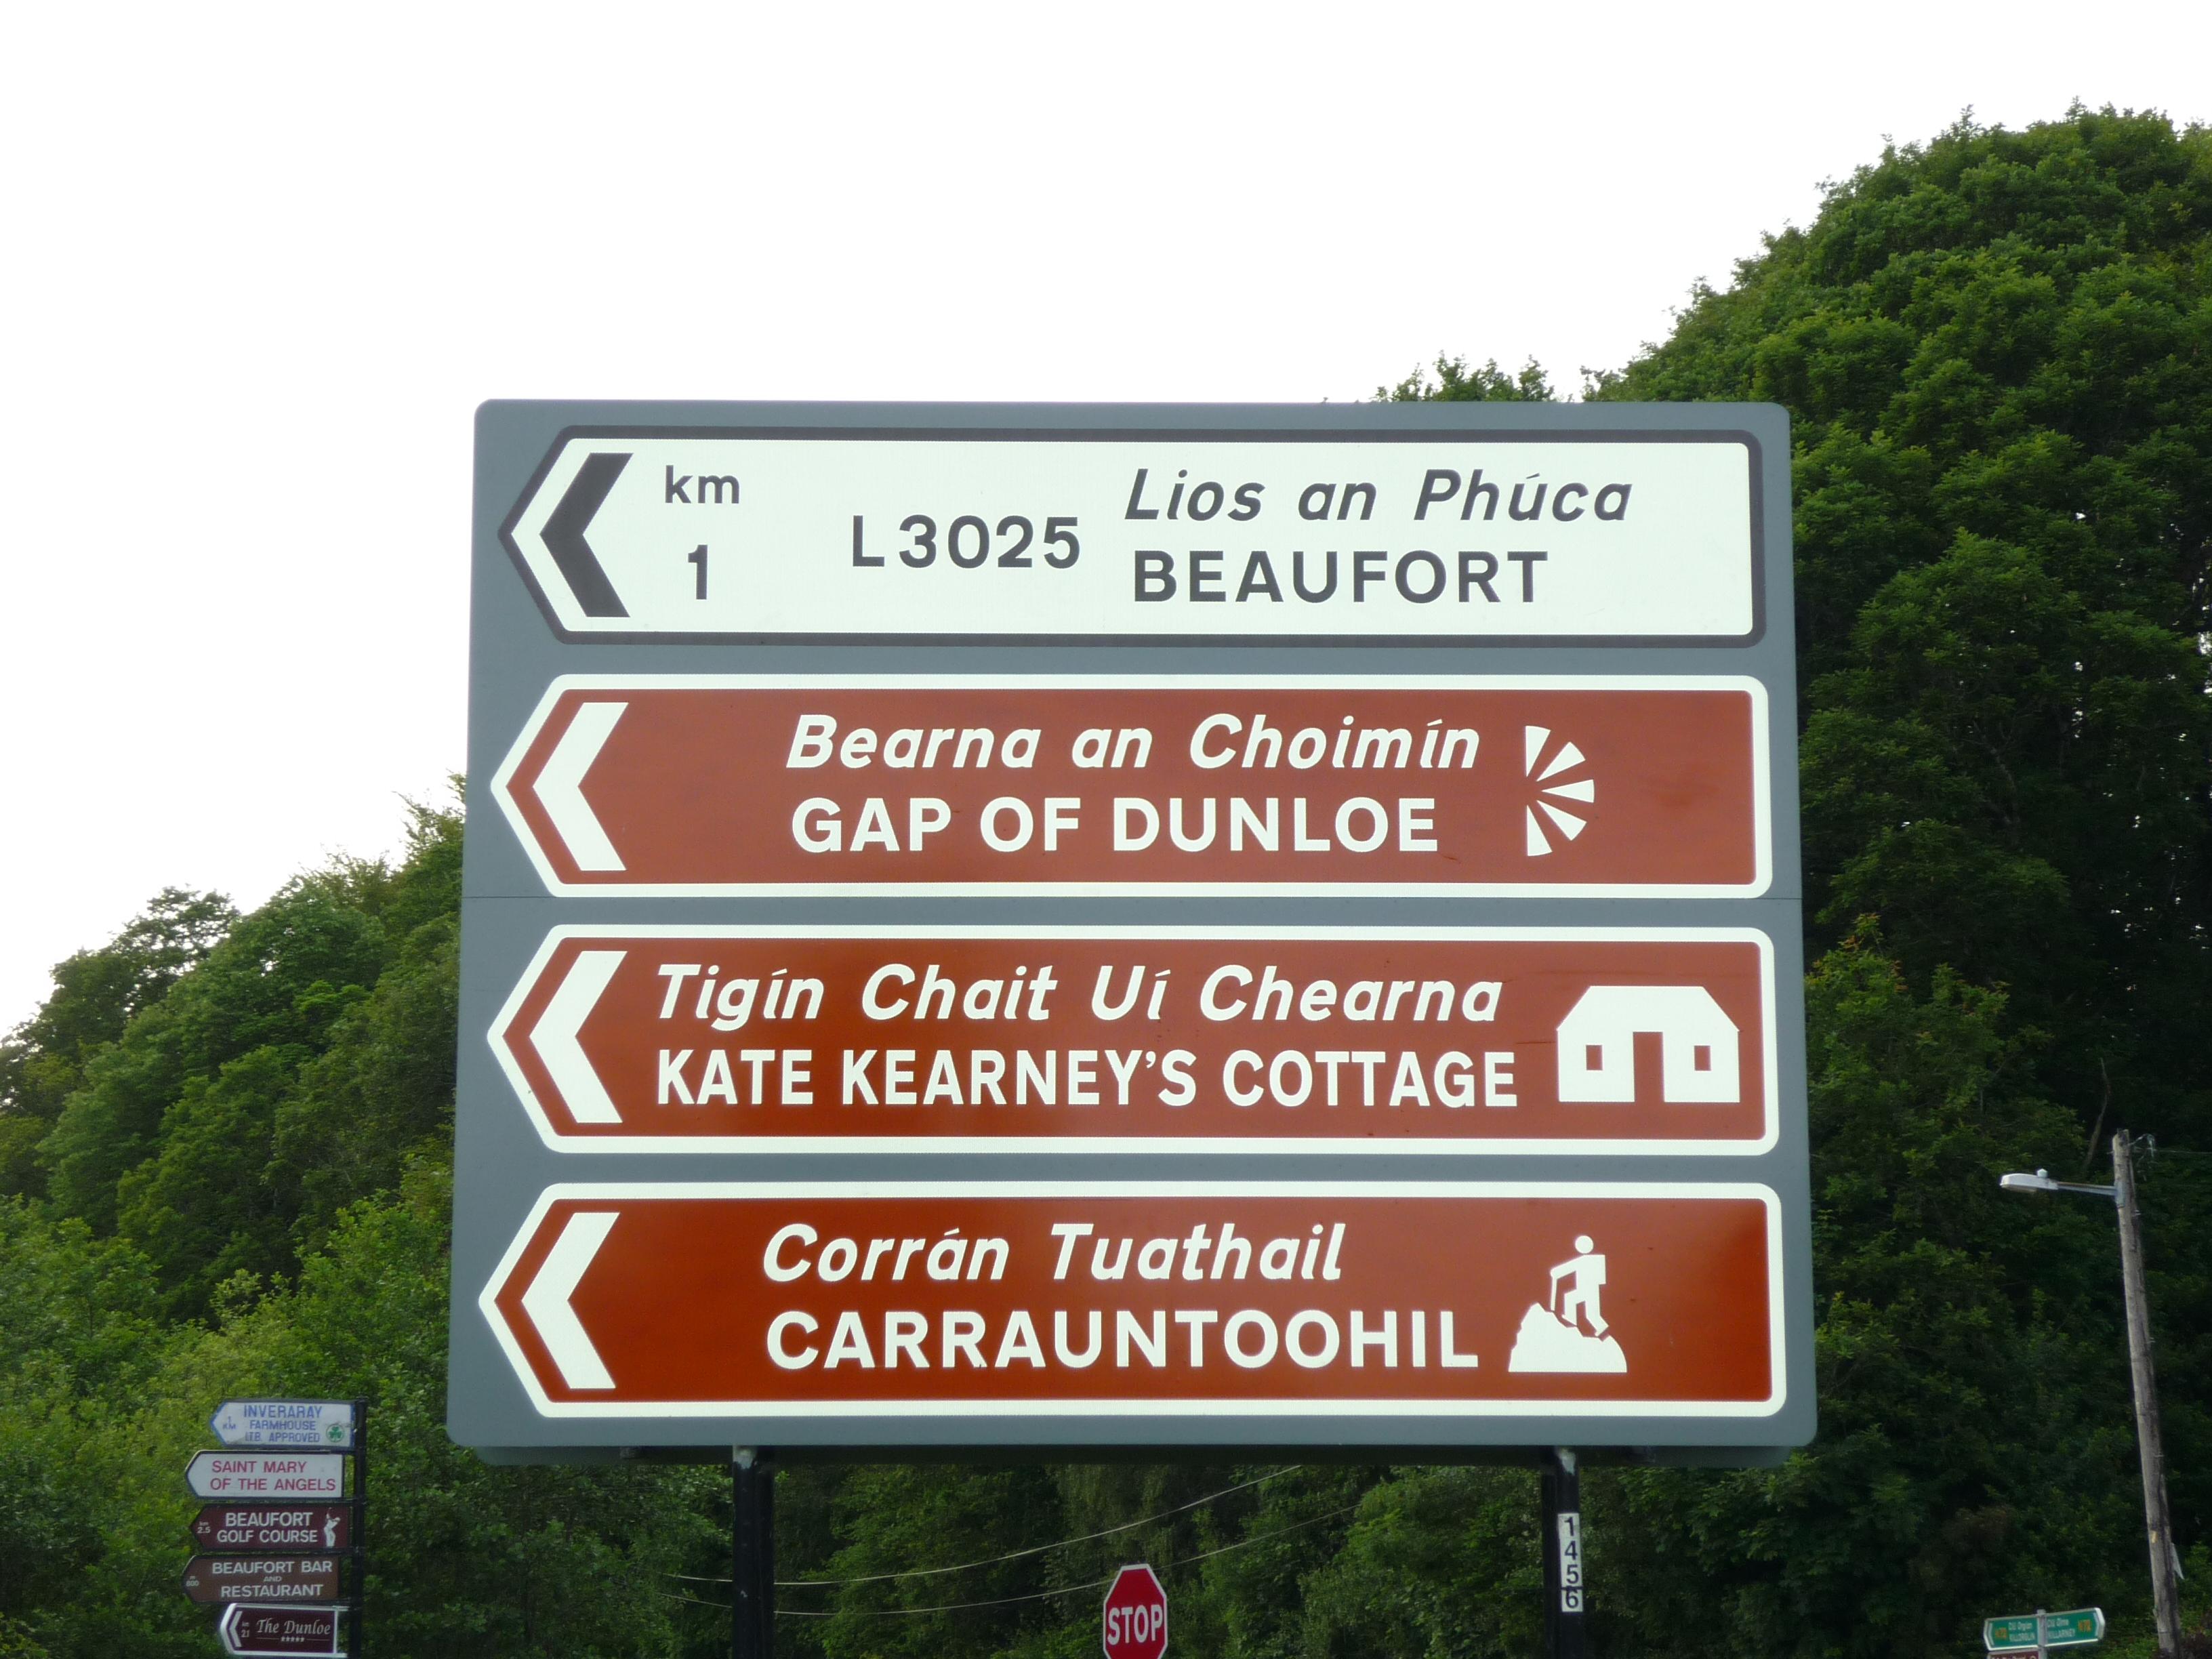 Road sign in Ireland